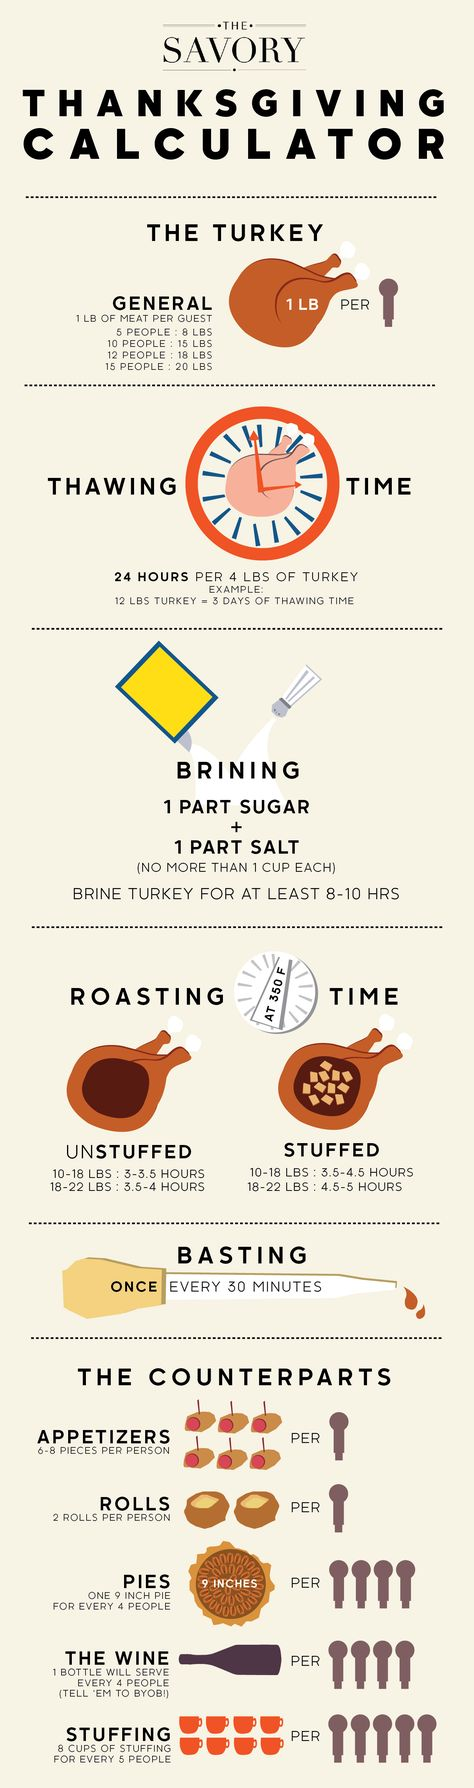 Super helpful Thanksgiving dinner planner by the savory.com #Infographic #Thanksgiving_Dinner_Plan